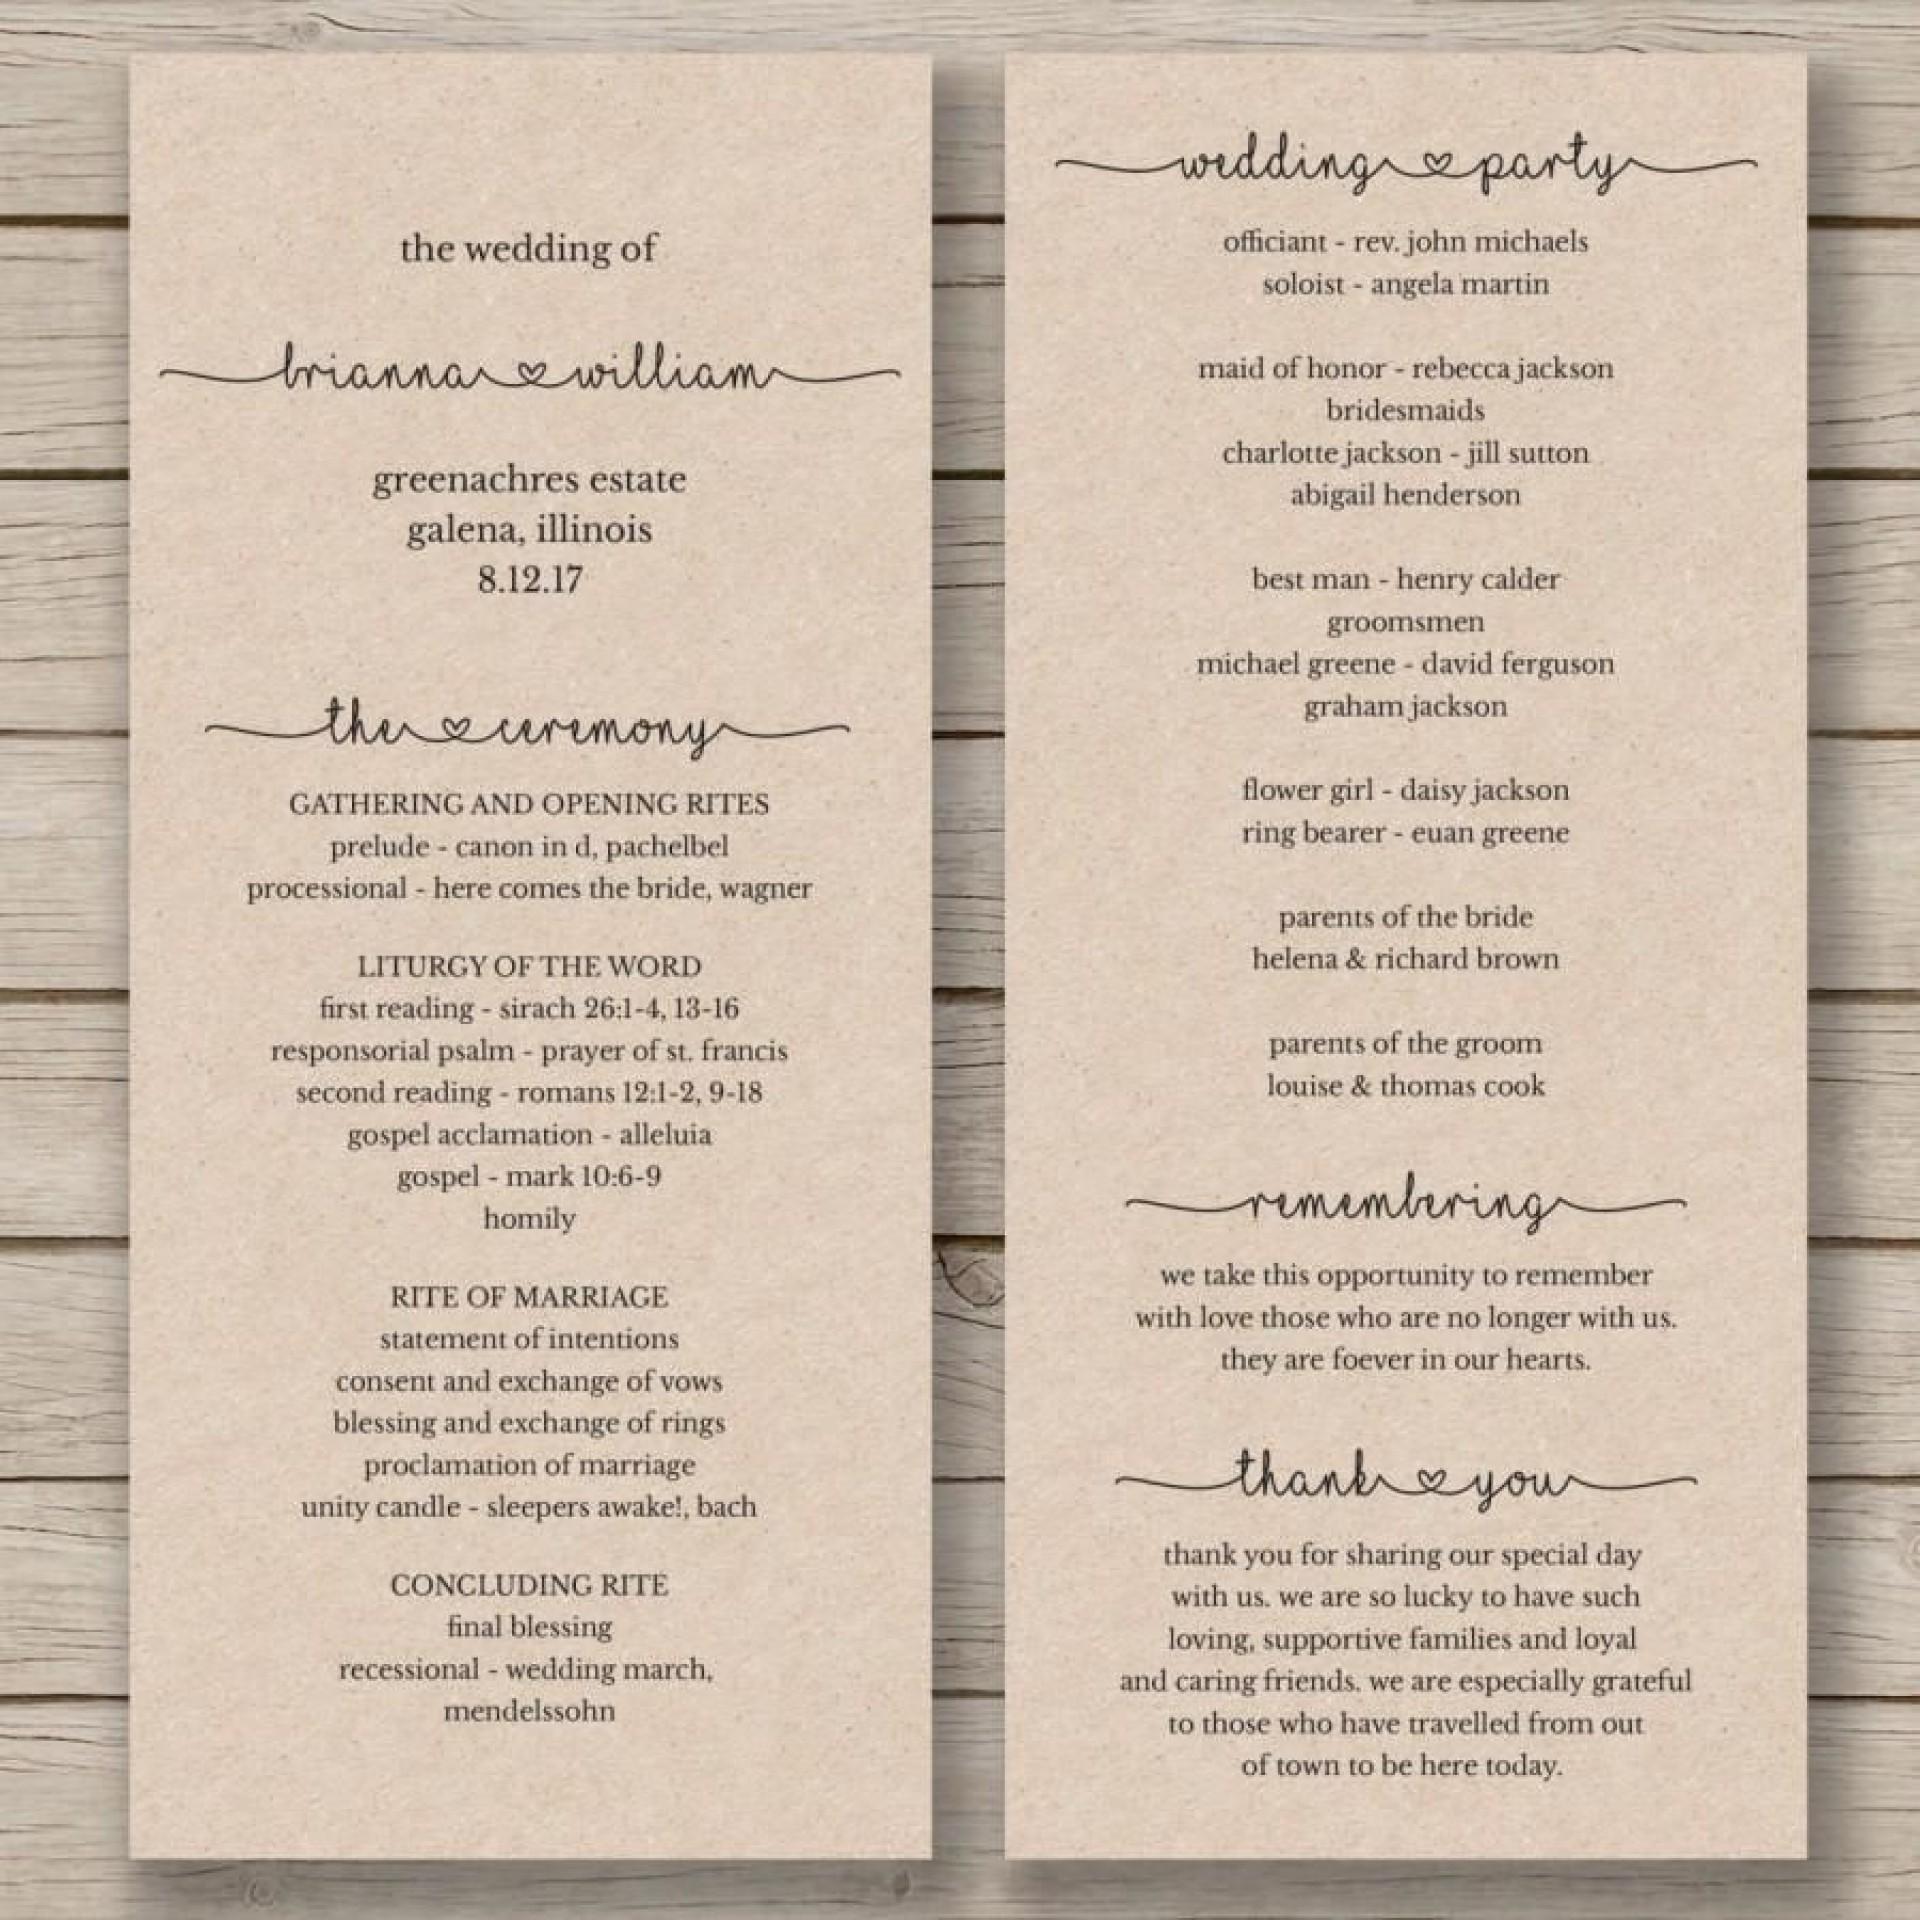 007 Stirring Wedding Order Of Service Template Word Photo  Free Microsoft1920